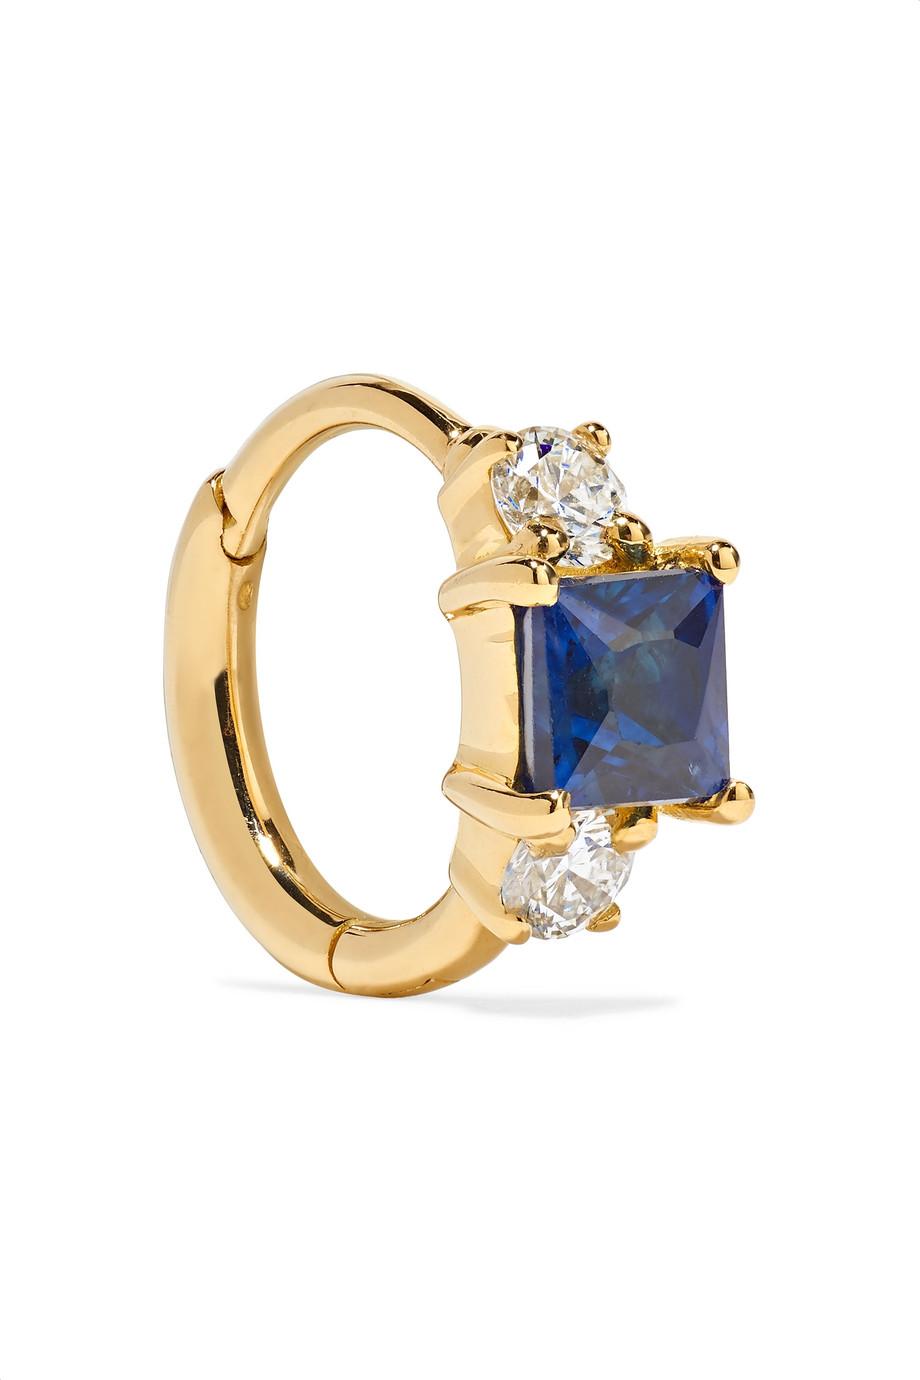 Maria Tash 6.5mm 18-karat gold, sapphire and diamond hoop earring